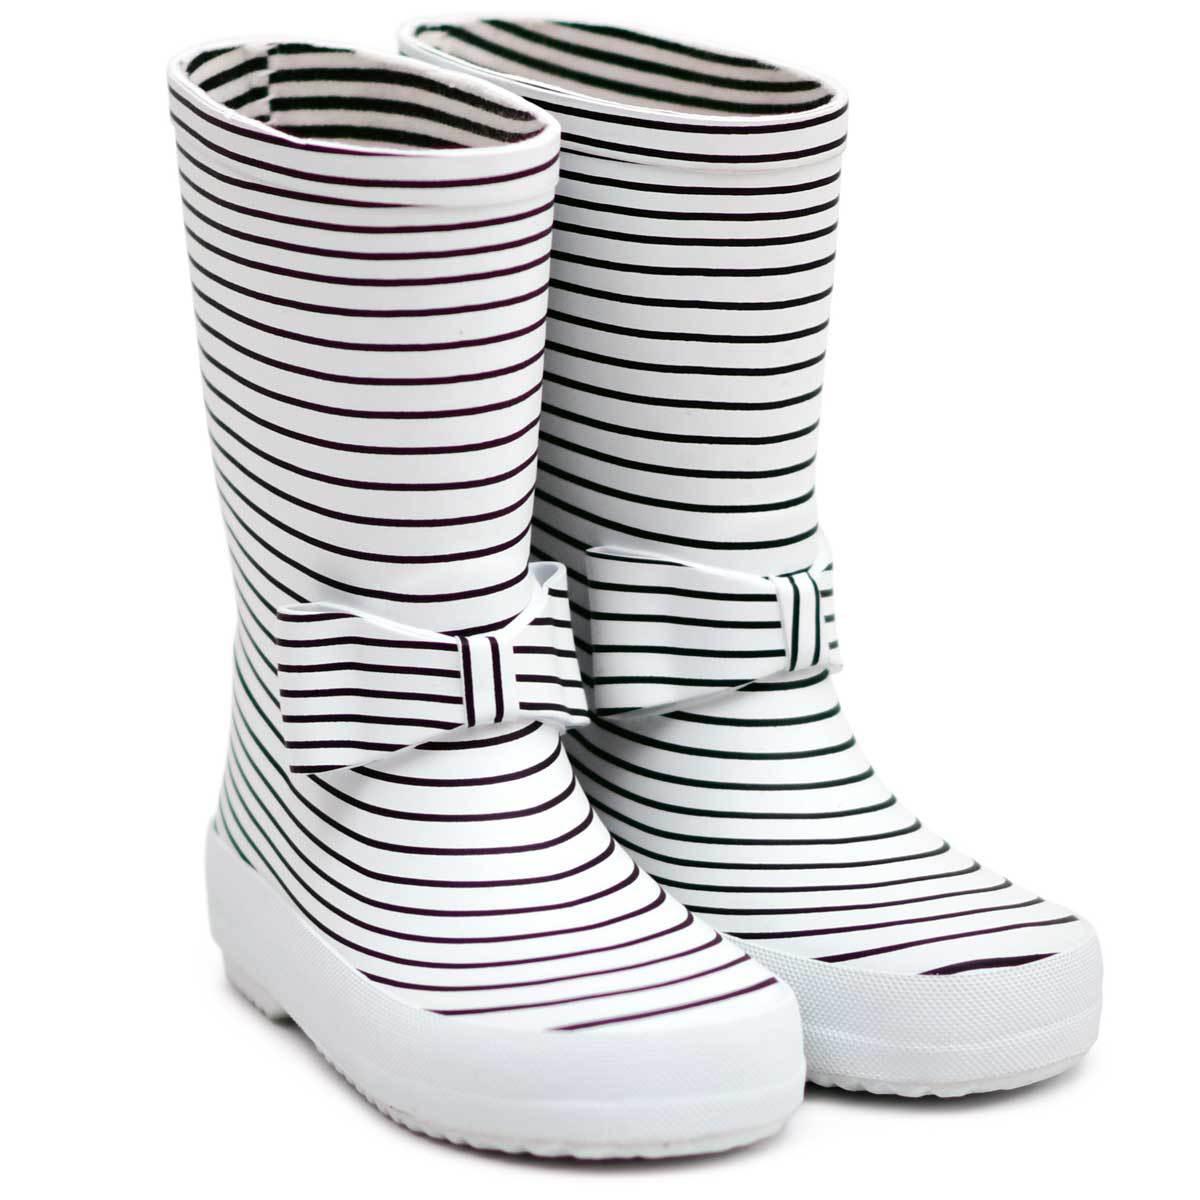 Chaussons & Chaussures Bottes Boxbonaute Bowtie - 24 Bottes Boxbonaute Bowtie - 24